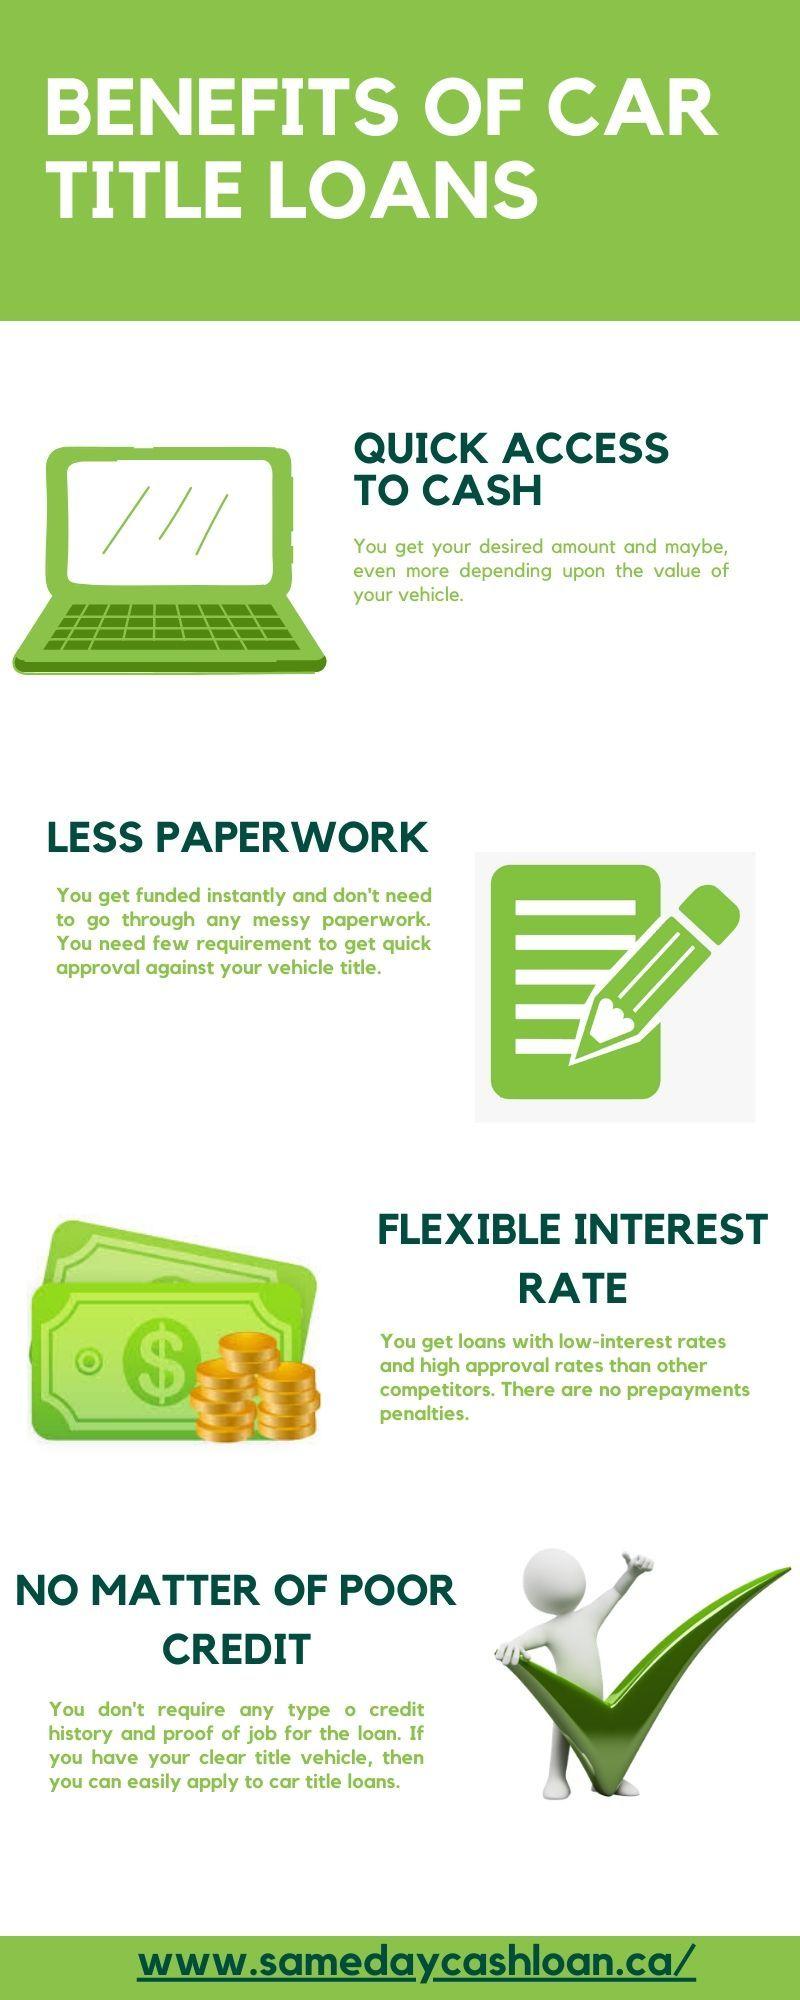 Get Car Title Loans At Flexible Interest Rates In 2020 Car Title Cash Loans Fast Cash Loans